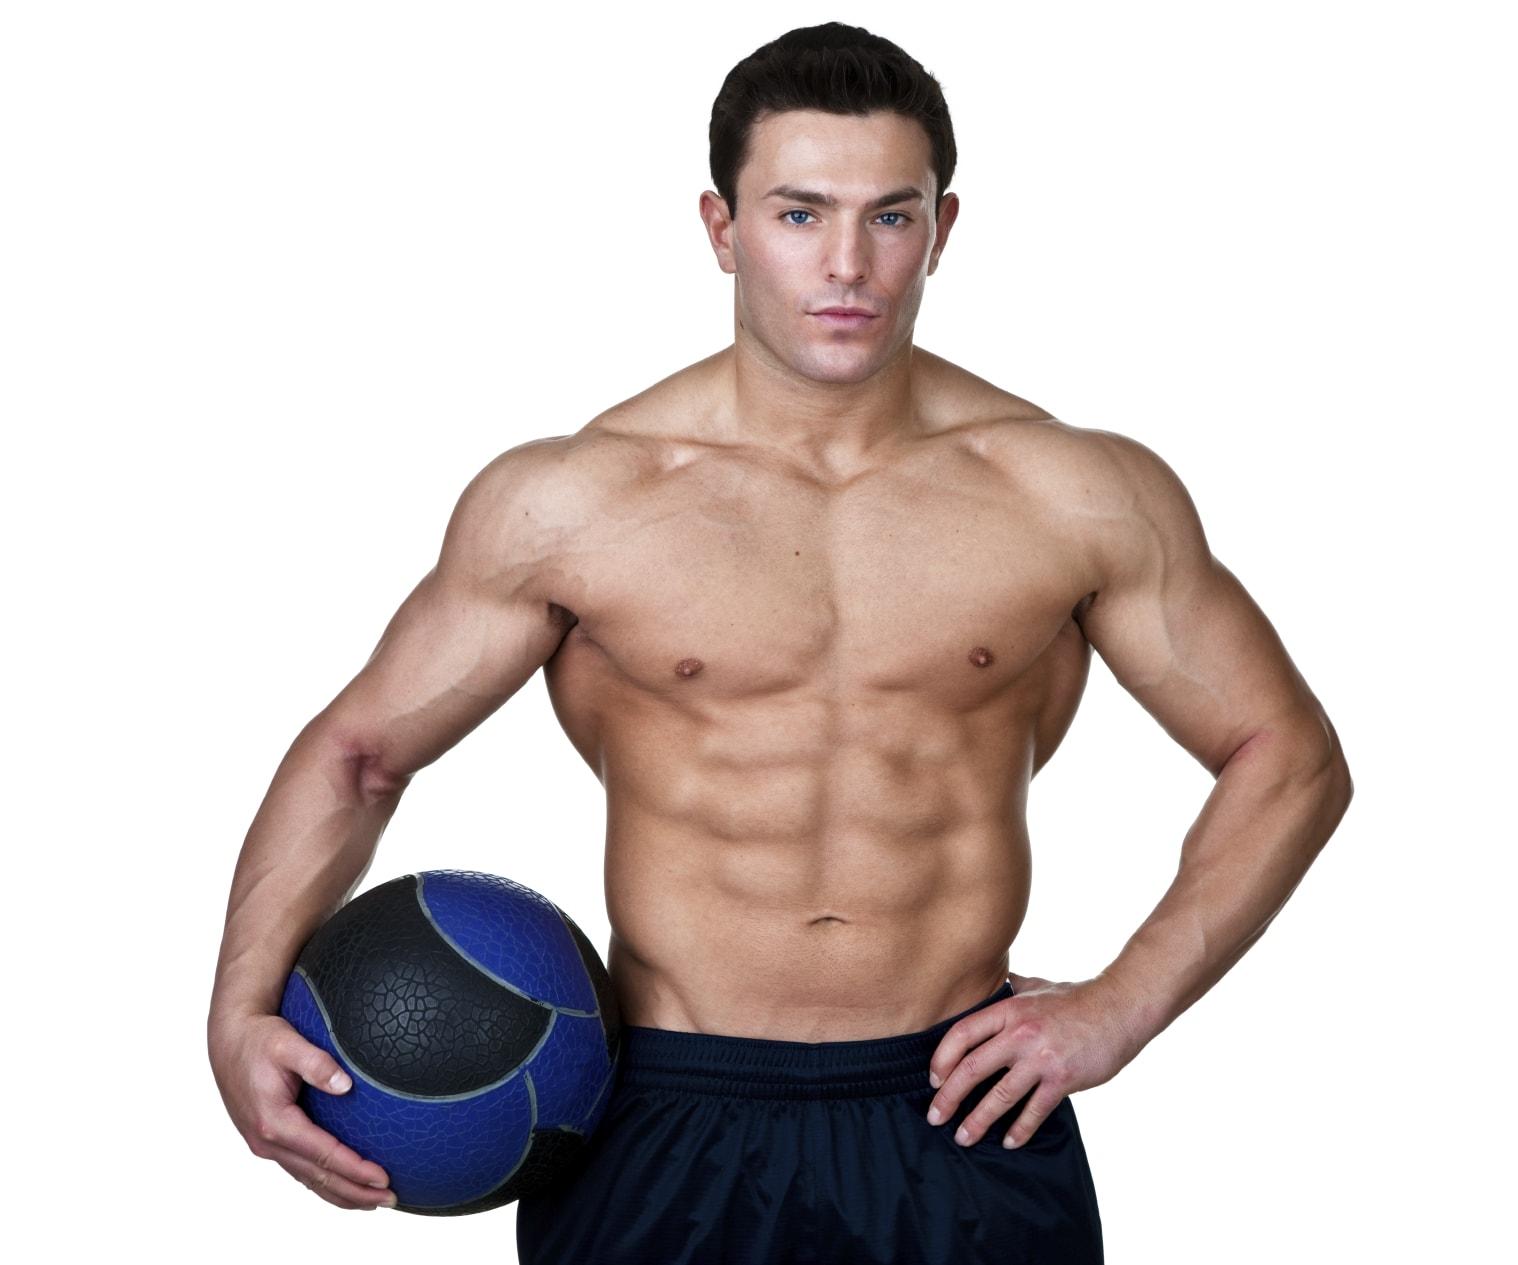 Ganar masa muscular rápido: 4 Errores que debemos evitar